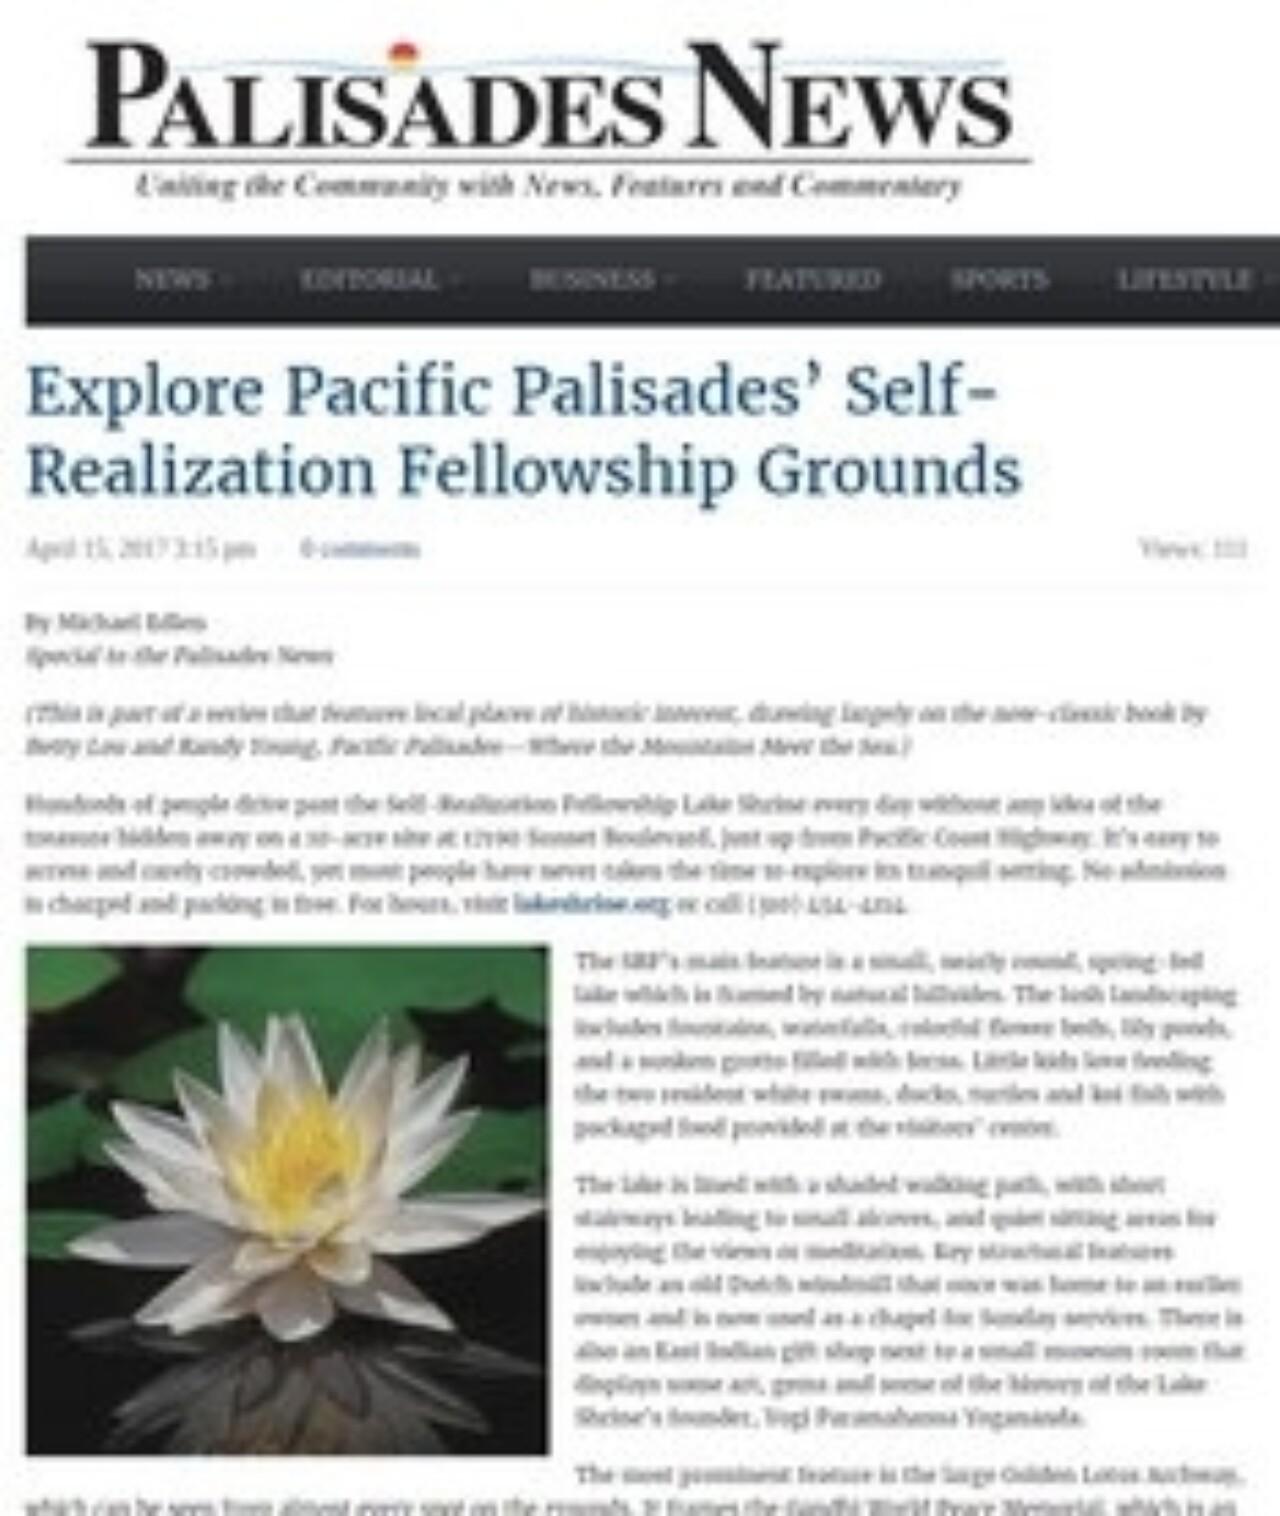 Palisades News features the SRF Lake Shrine